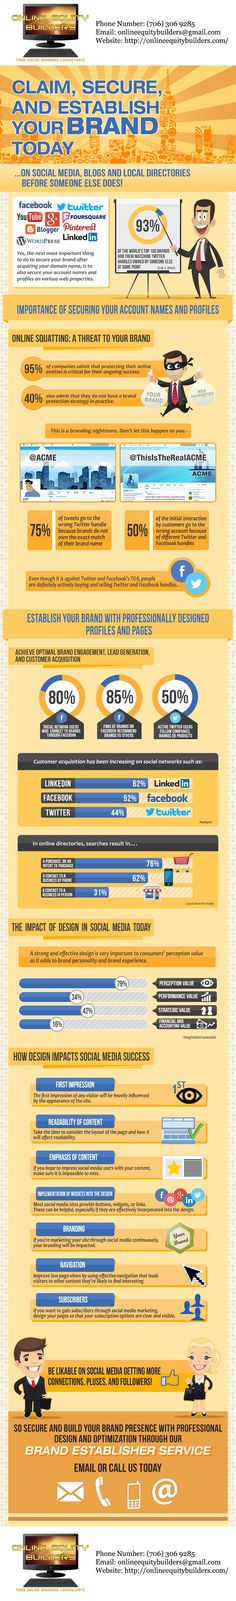 Online Equity Builders Brand Establisher Infographic